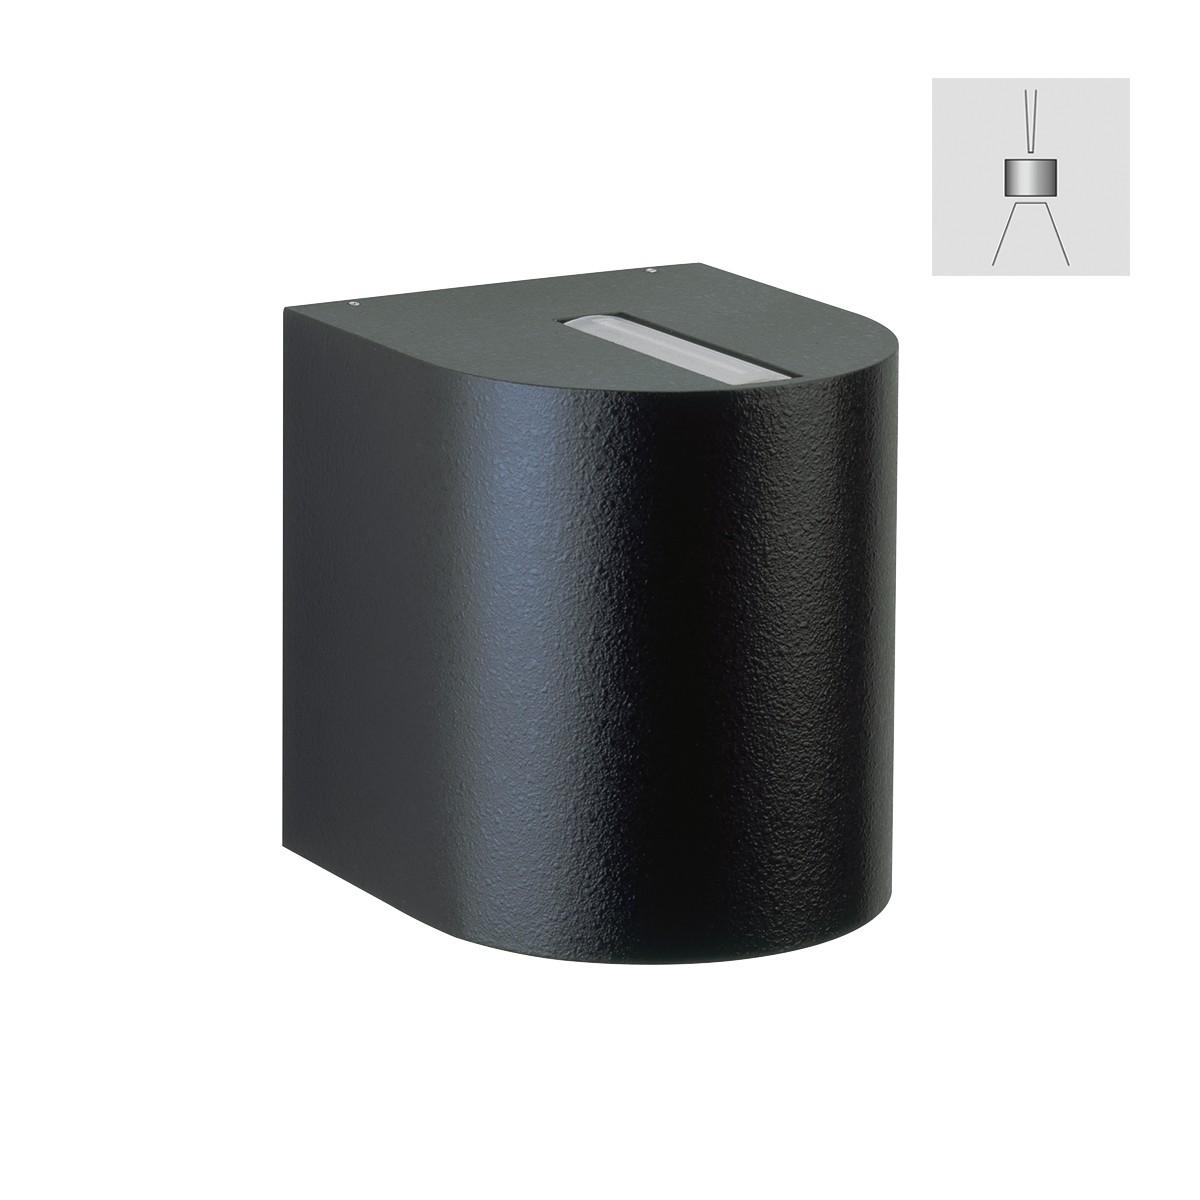 Albert 2401 Wandstrahler, eng/breit, schwarz